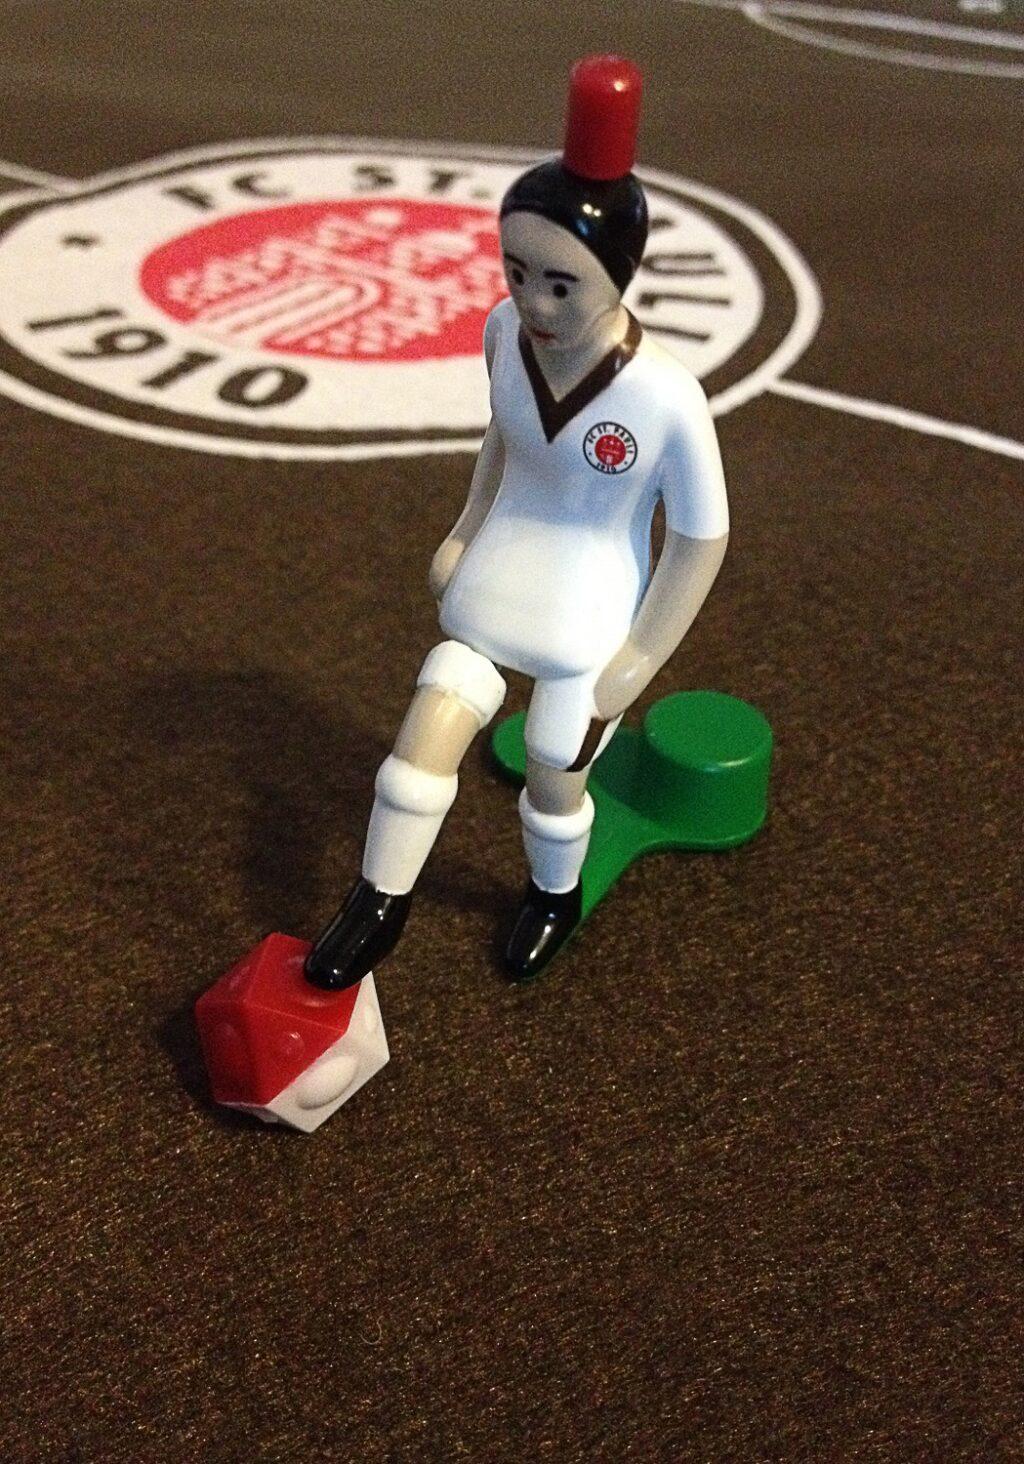 Tipp Kick FC St. Pauli Edition Spieler